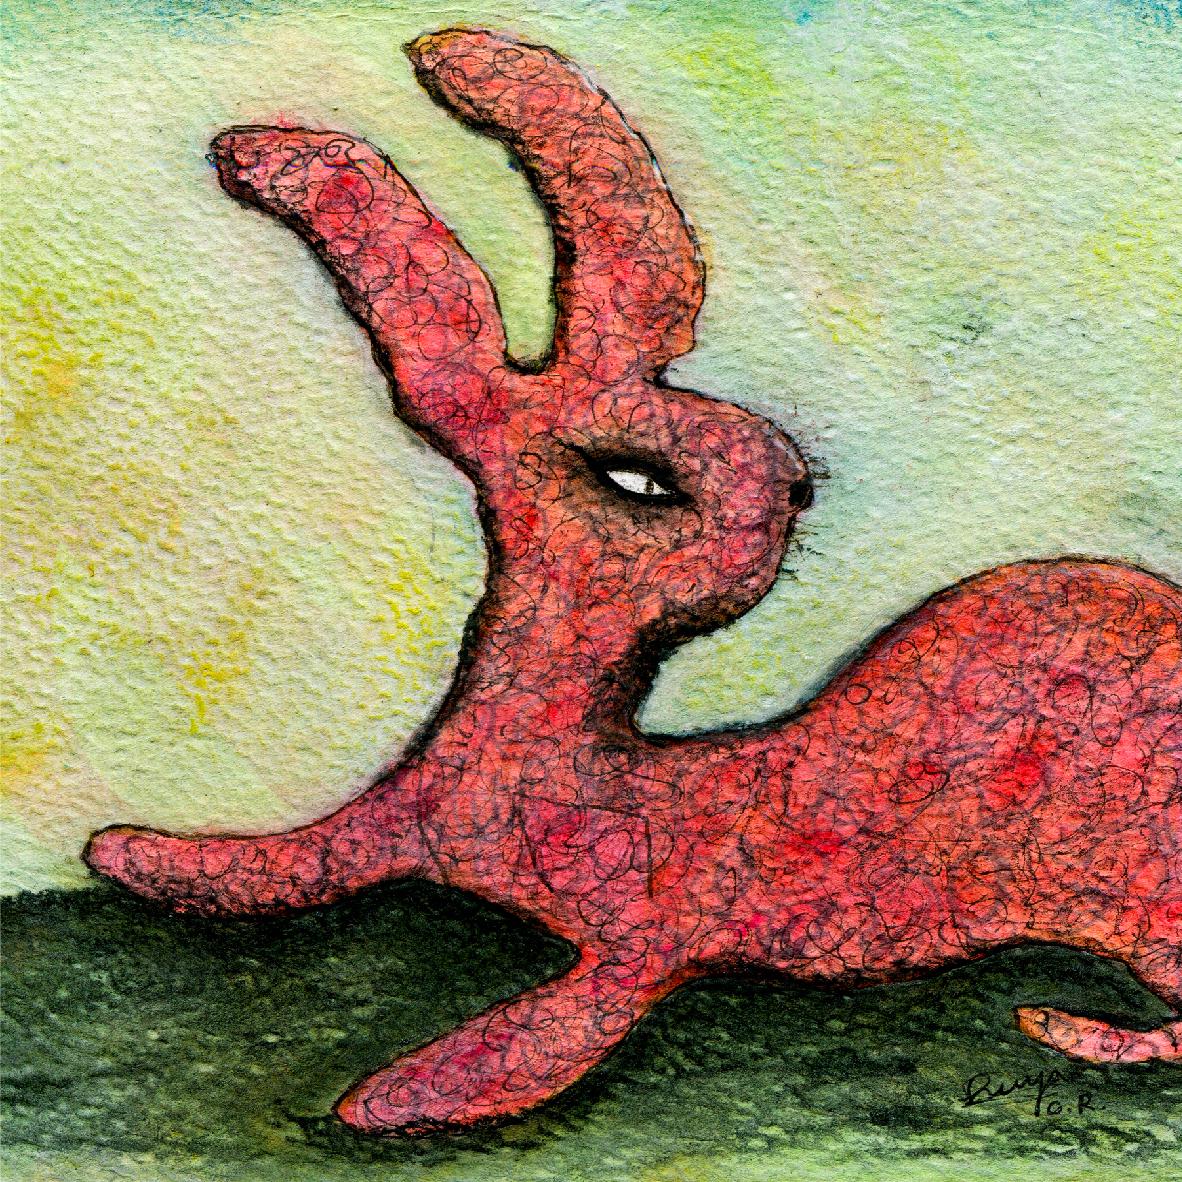 Imaginary Hare